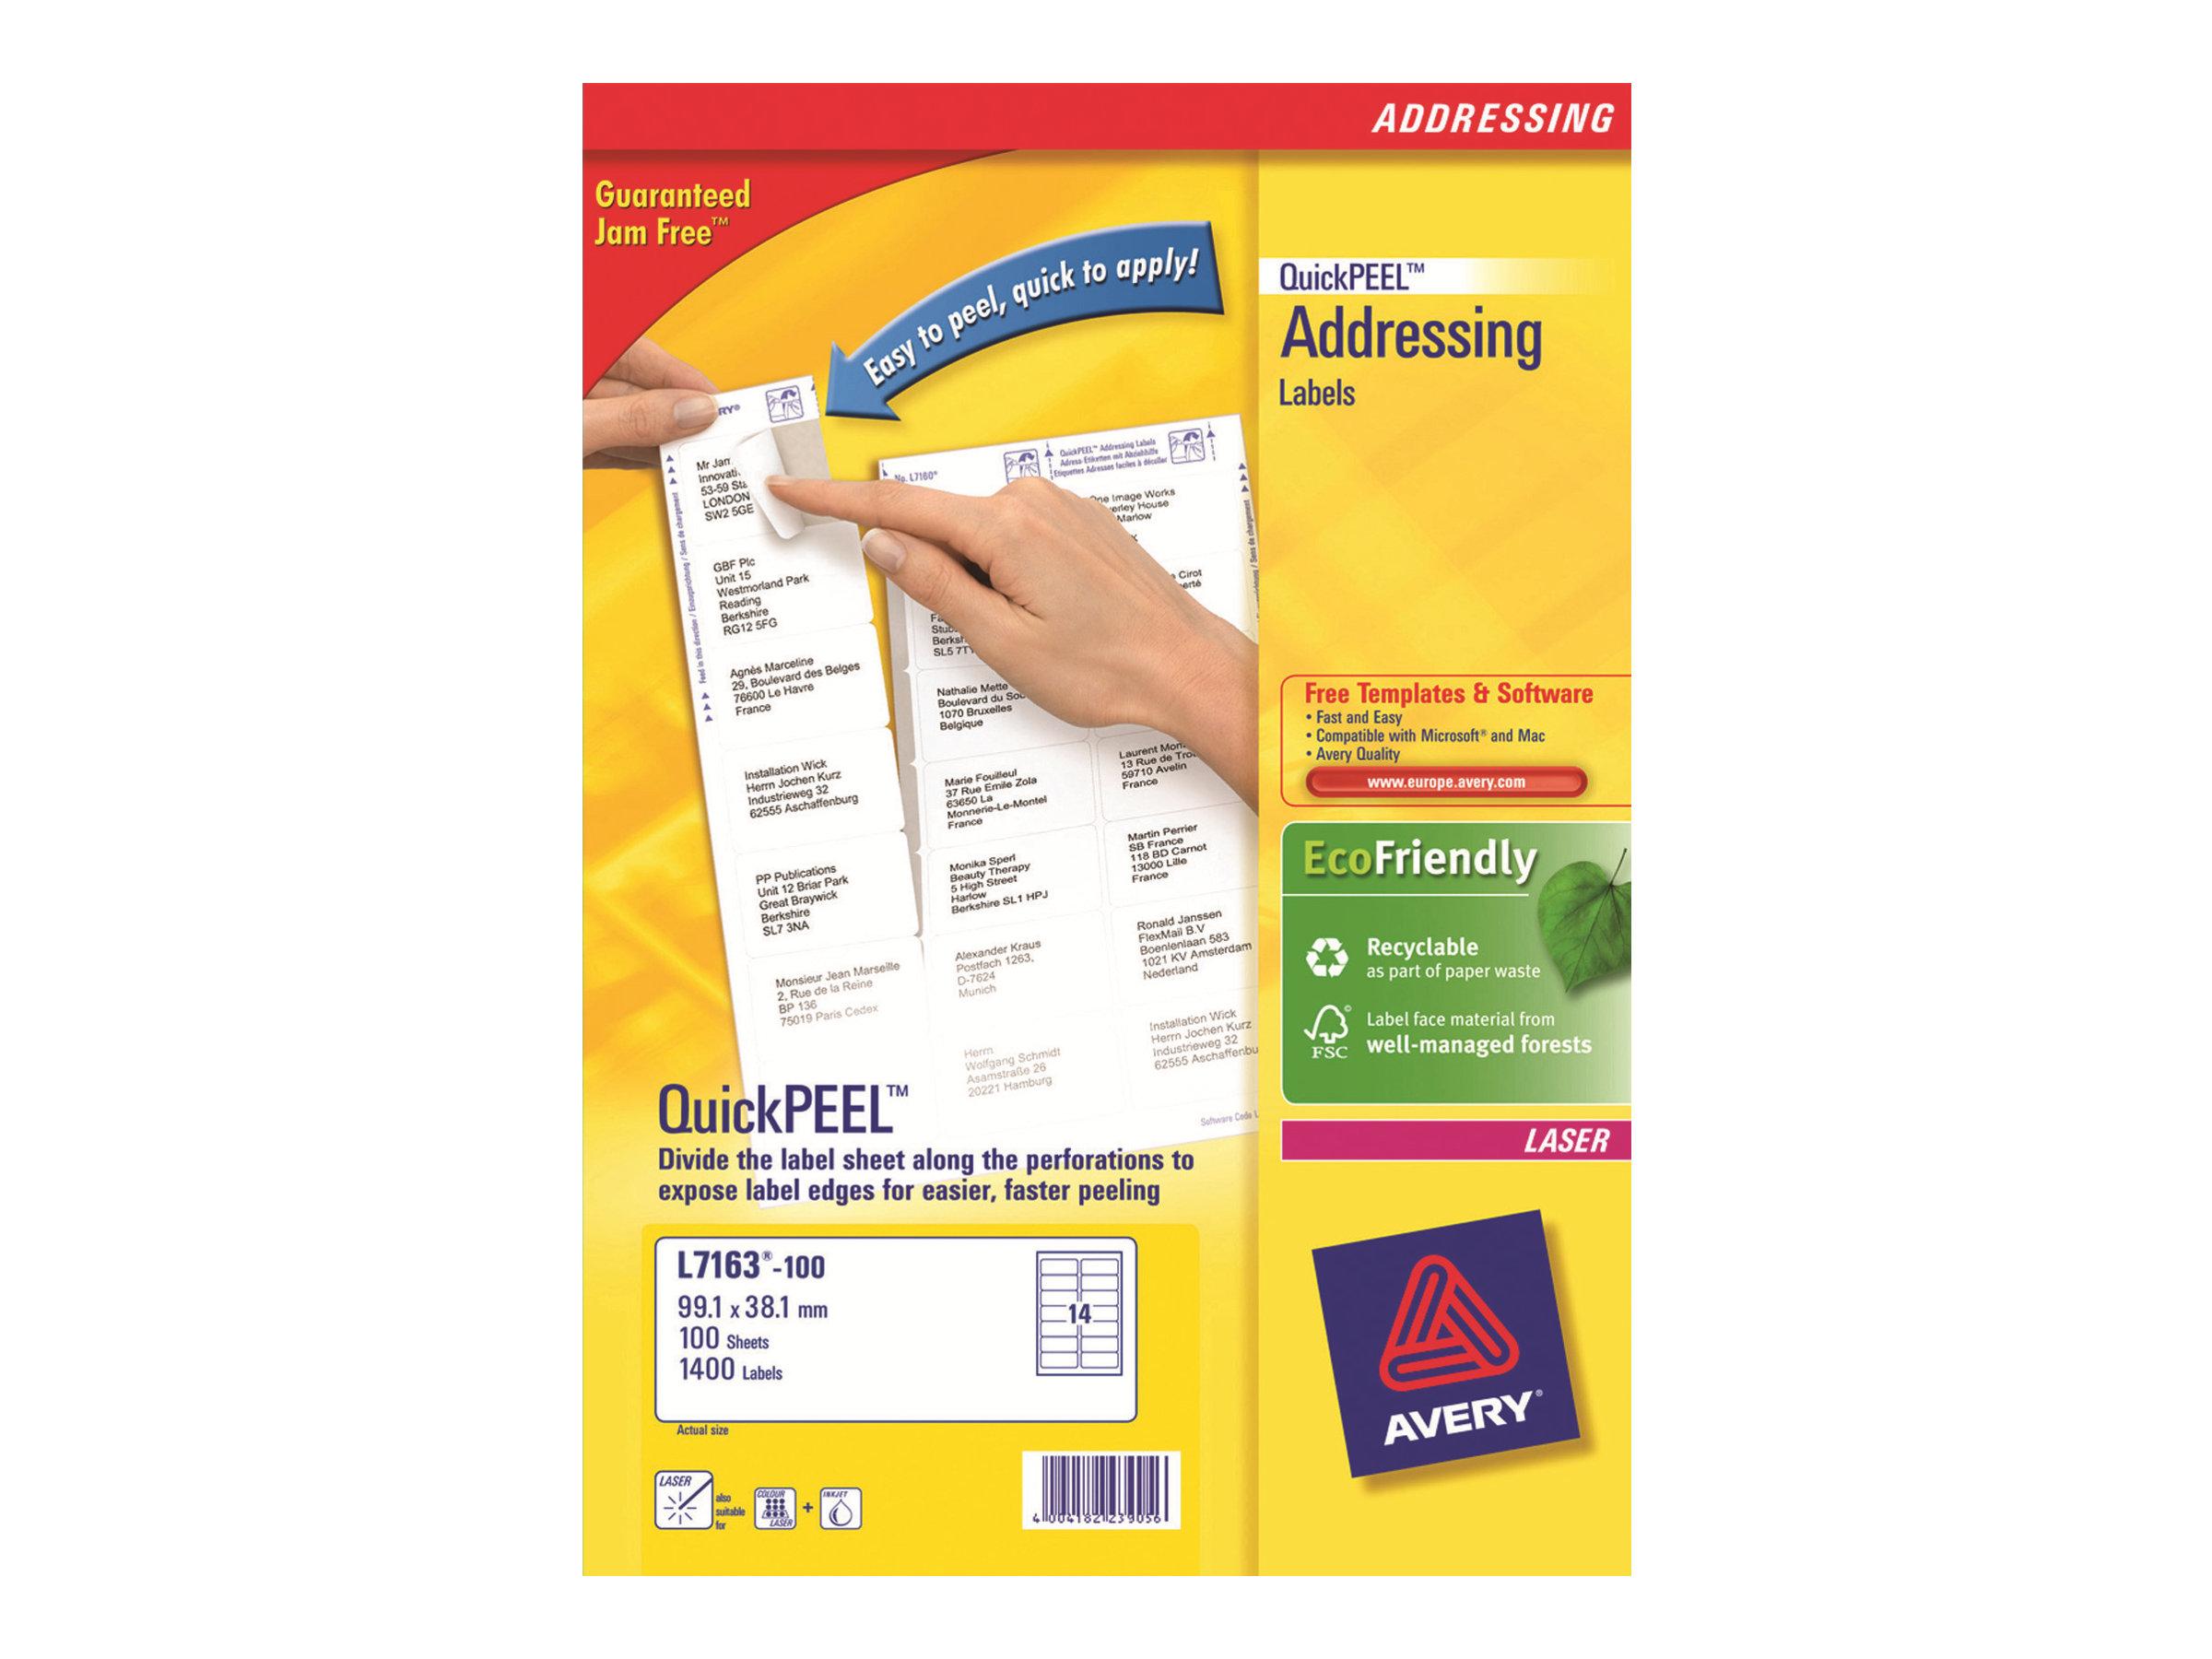 Avery - 1400 Étiquettes adresse recyclées blanches - 38,1 x 99,1 mm - Impression laser - réf LR7163-100